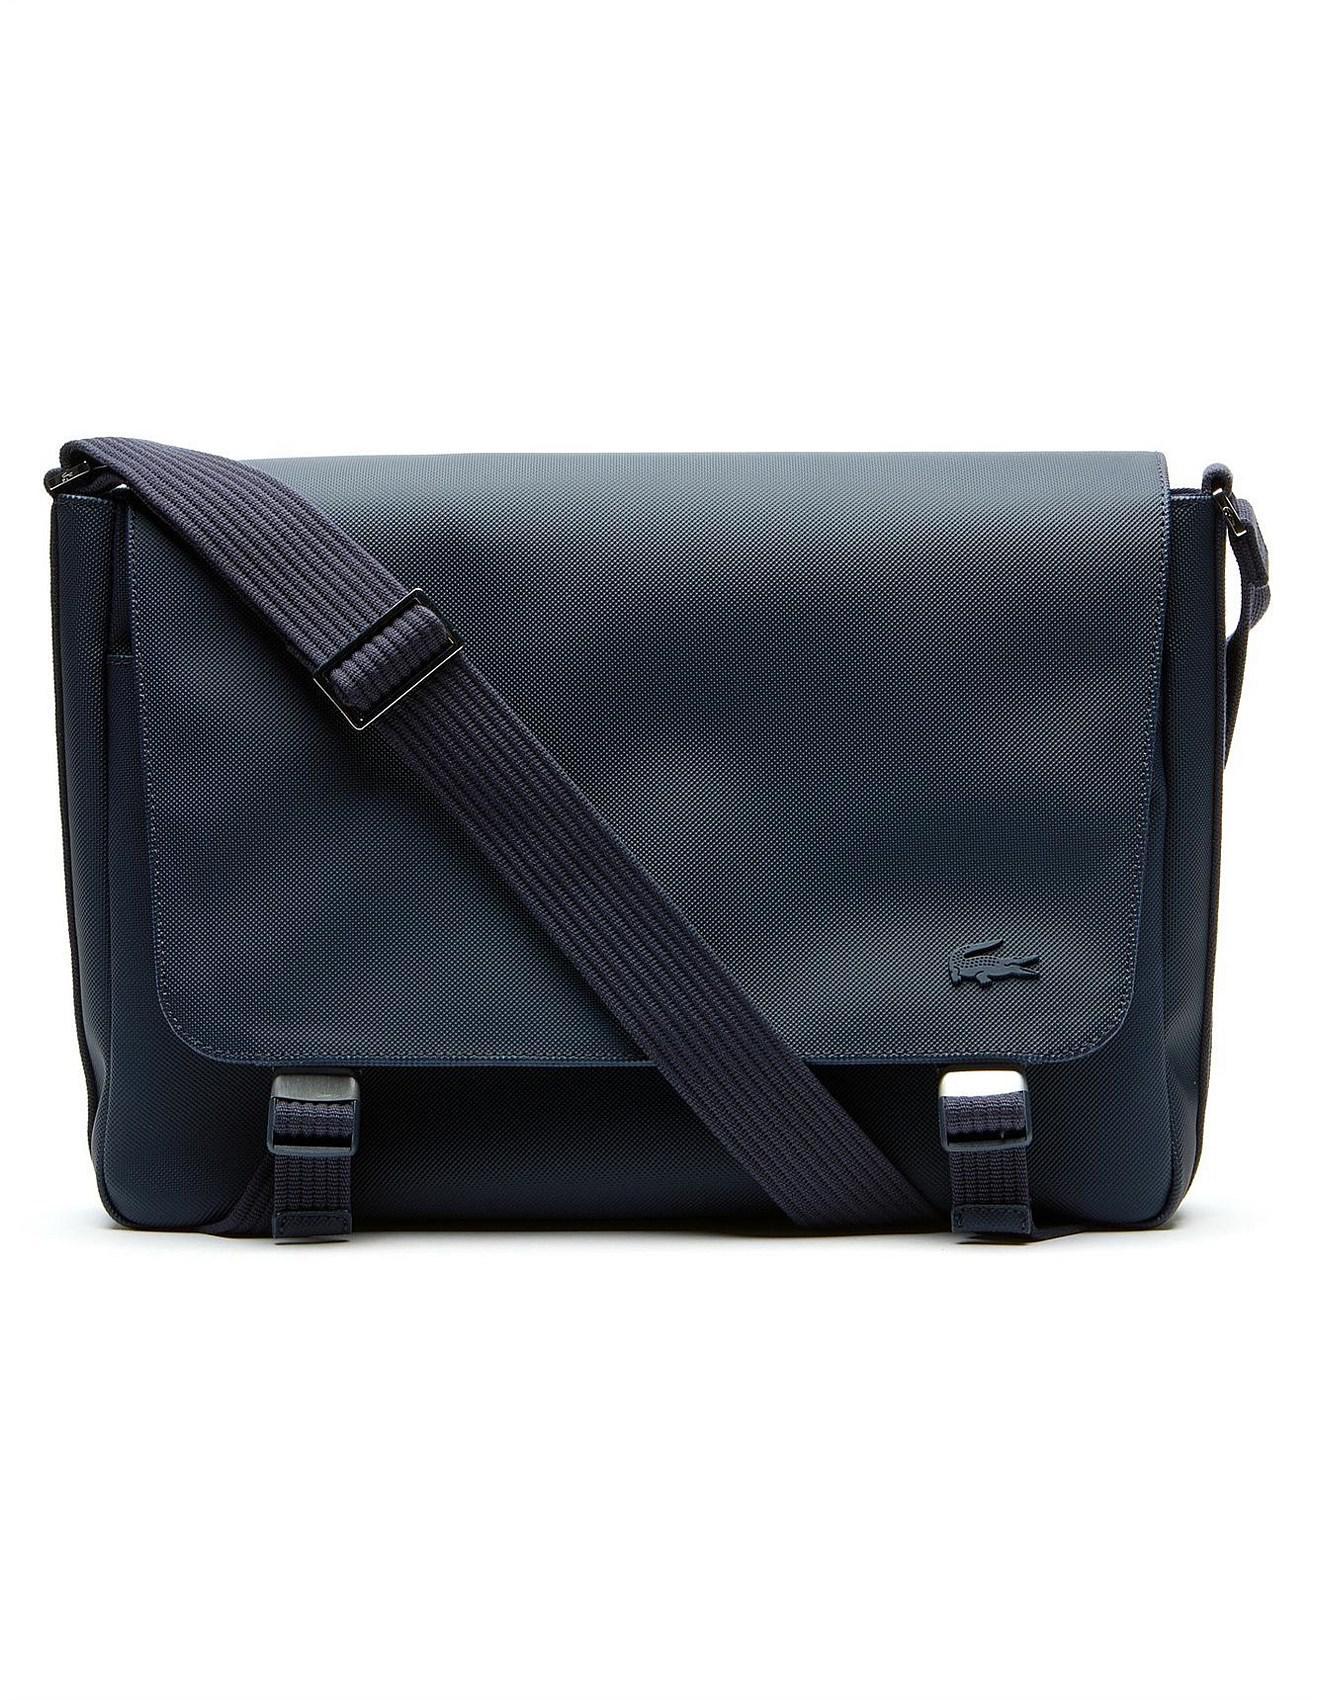 cdac3c1d7a7909 Lacoste Mens Classic Messenger Bag in Blue for Men - Lyst